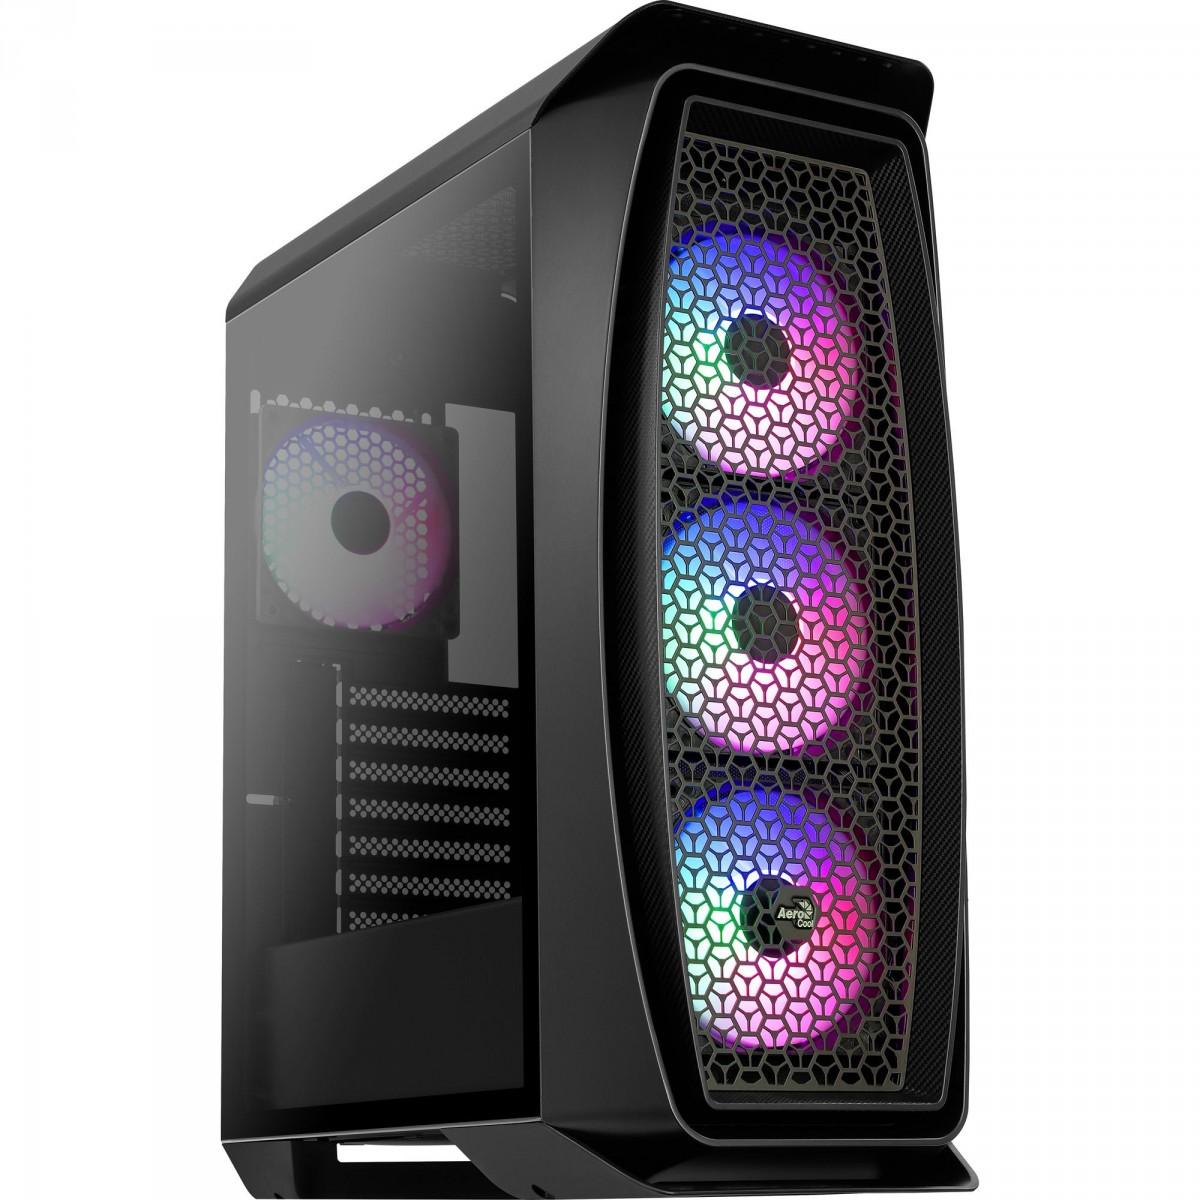 Gabinete Gamer Aerocool, Aero One Frost RGB, Mid Tower, Vidro Temperado, Black, 70167, Sem Fonte, Com 4 Fans